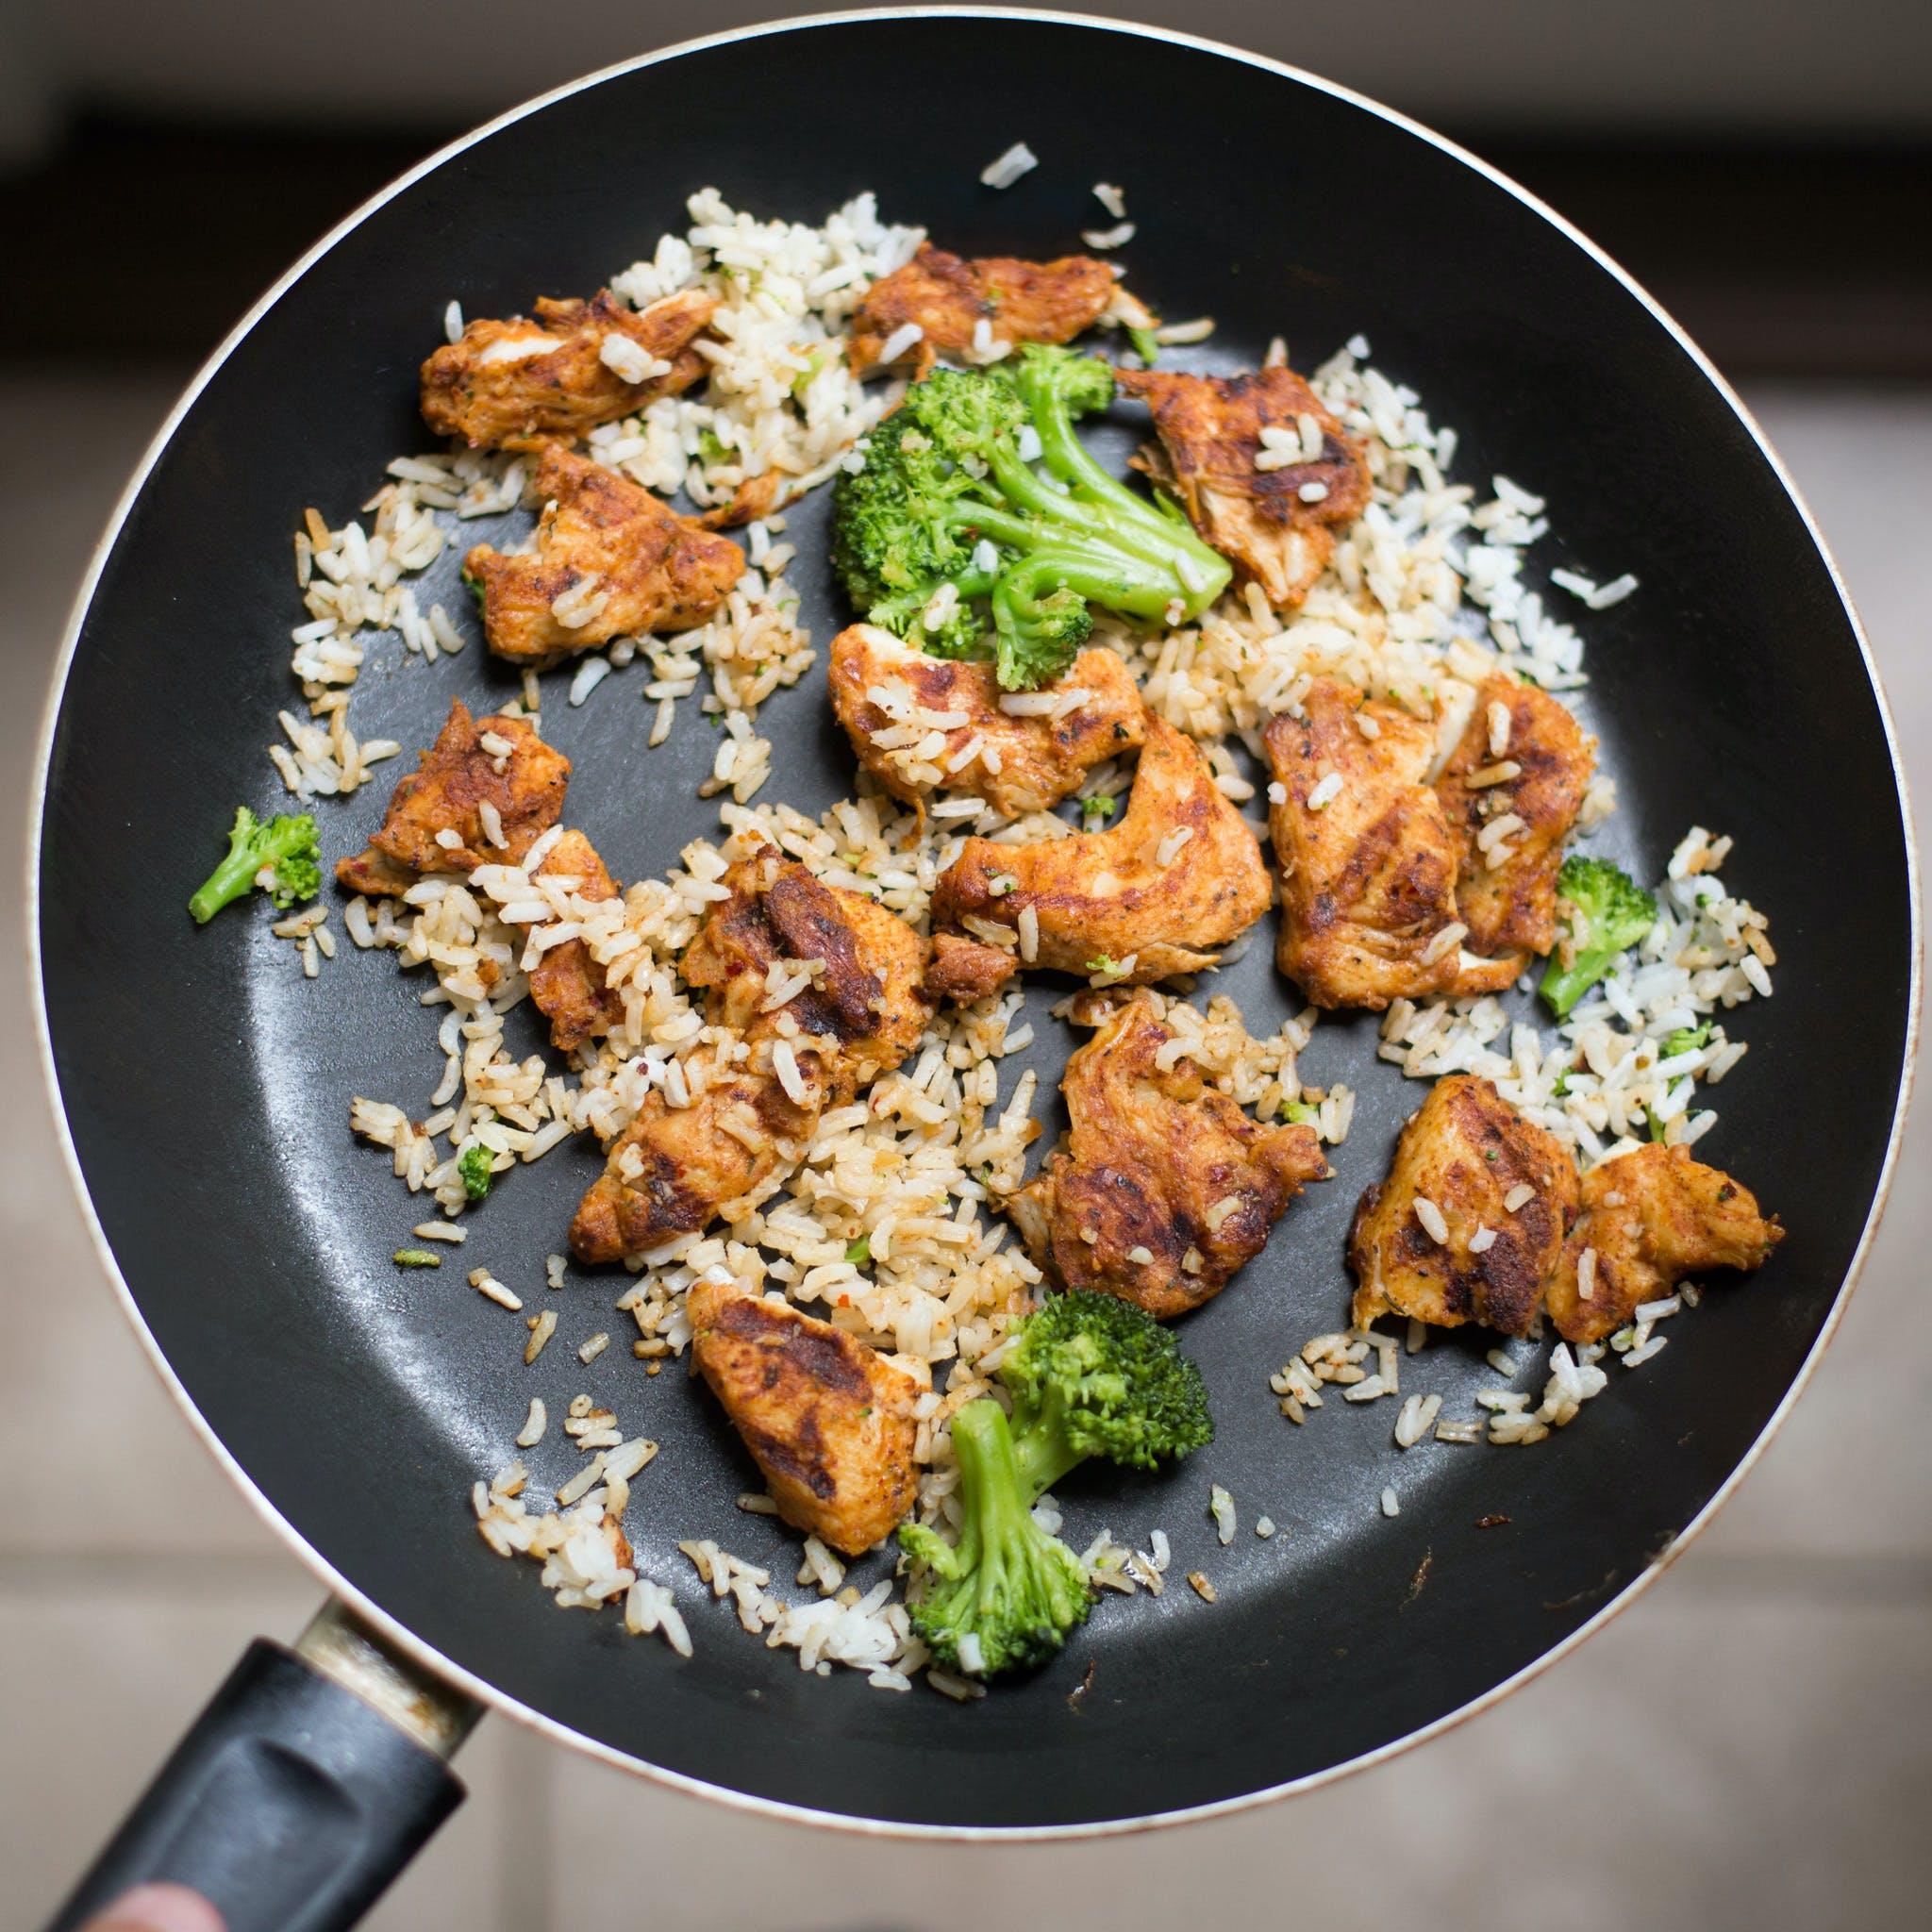 Foto d'estoc gratuïta de àpat, arròs, bròquil, deliciós